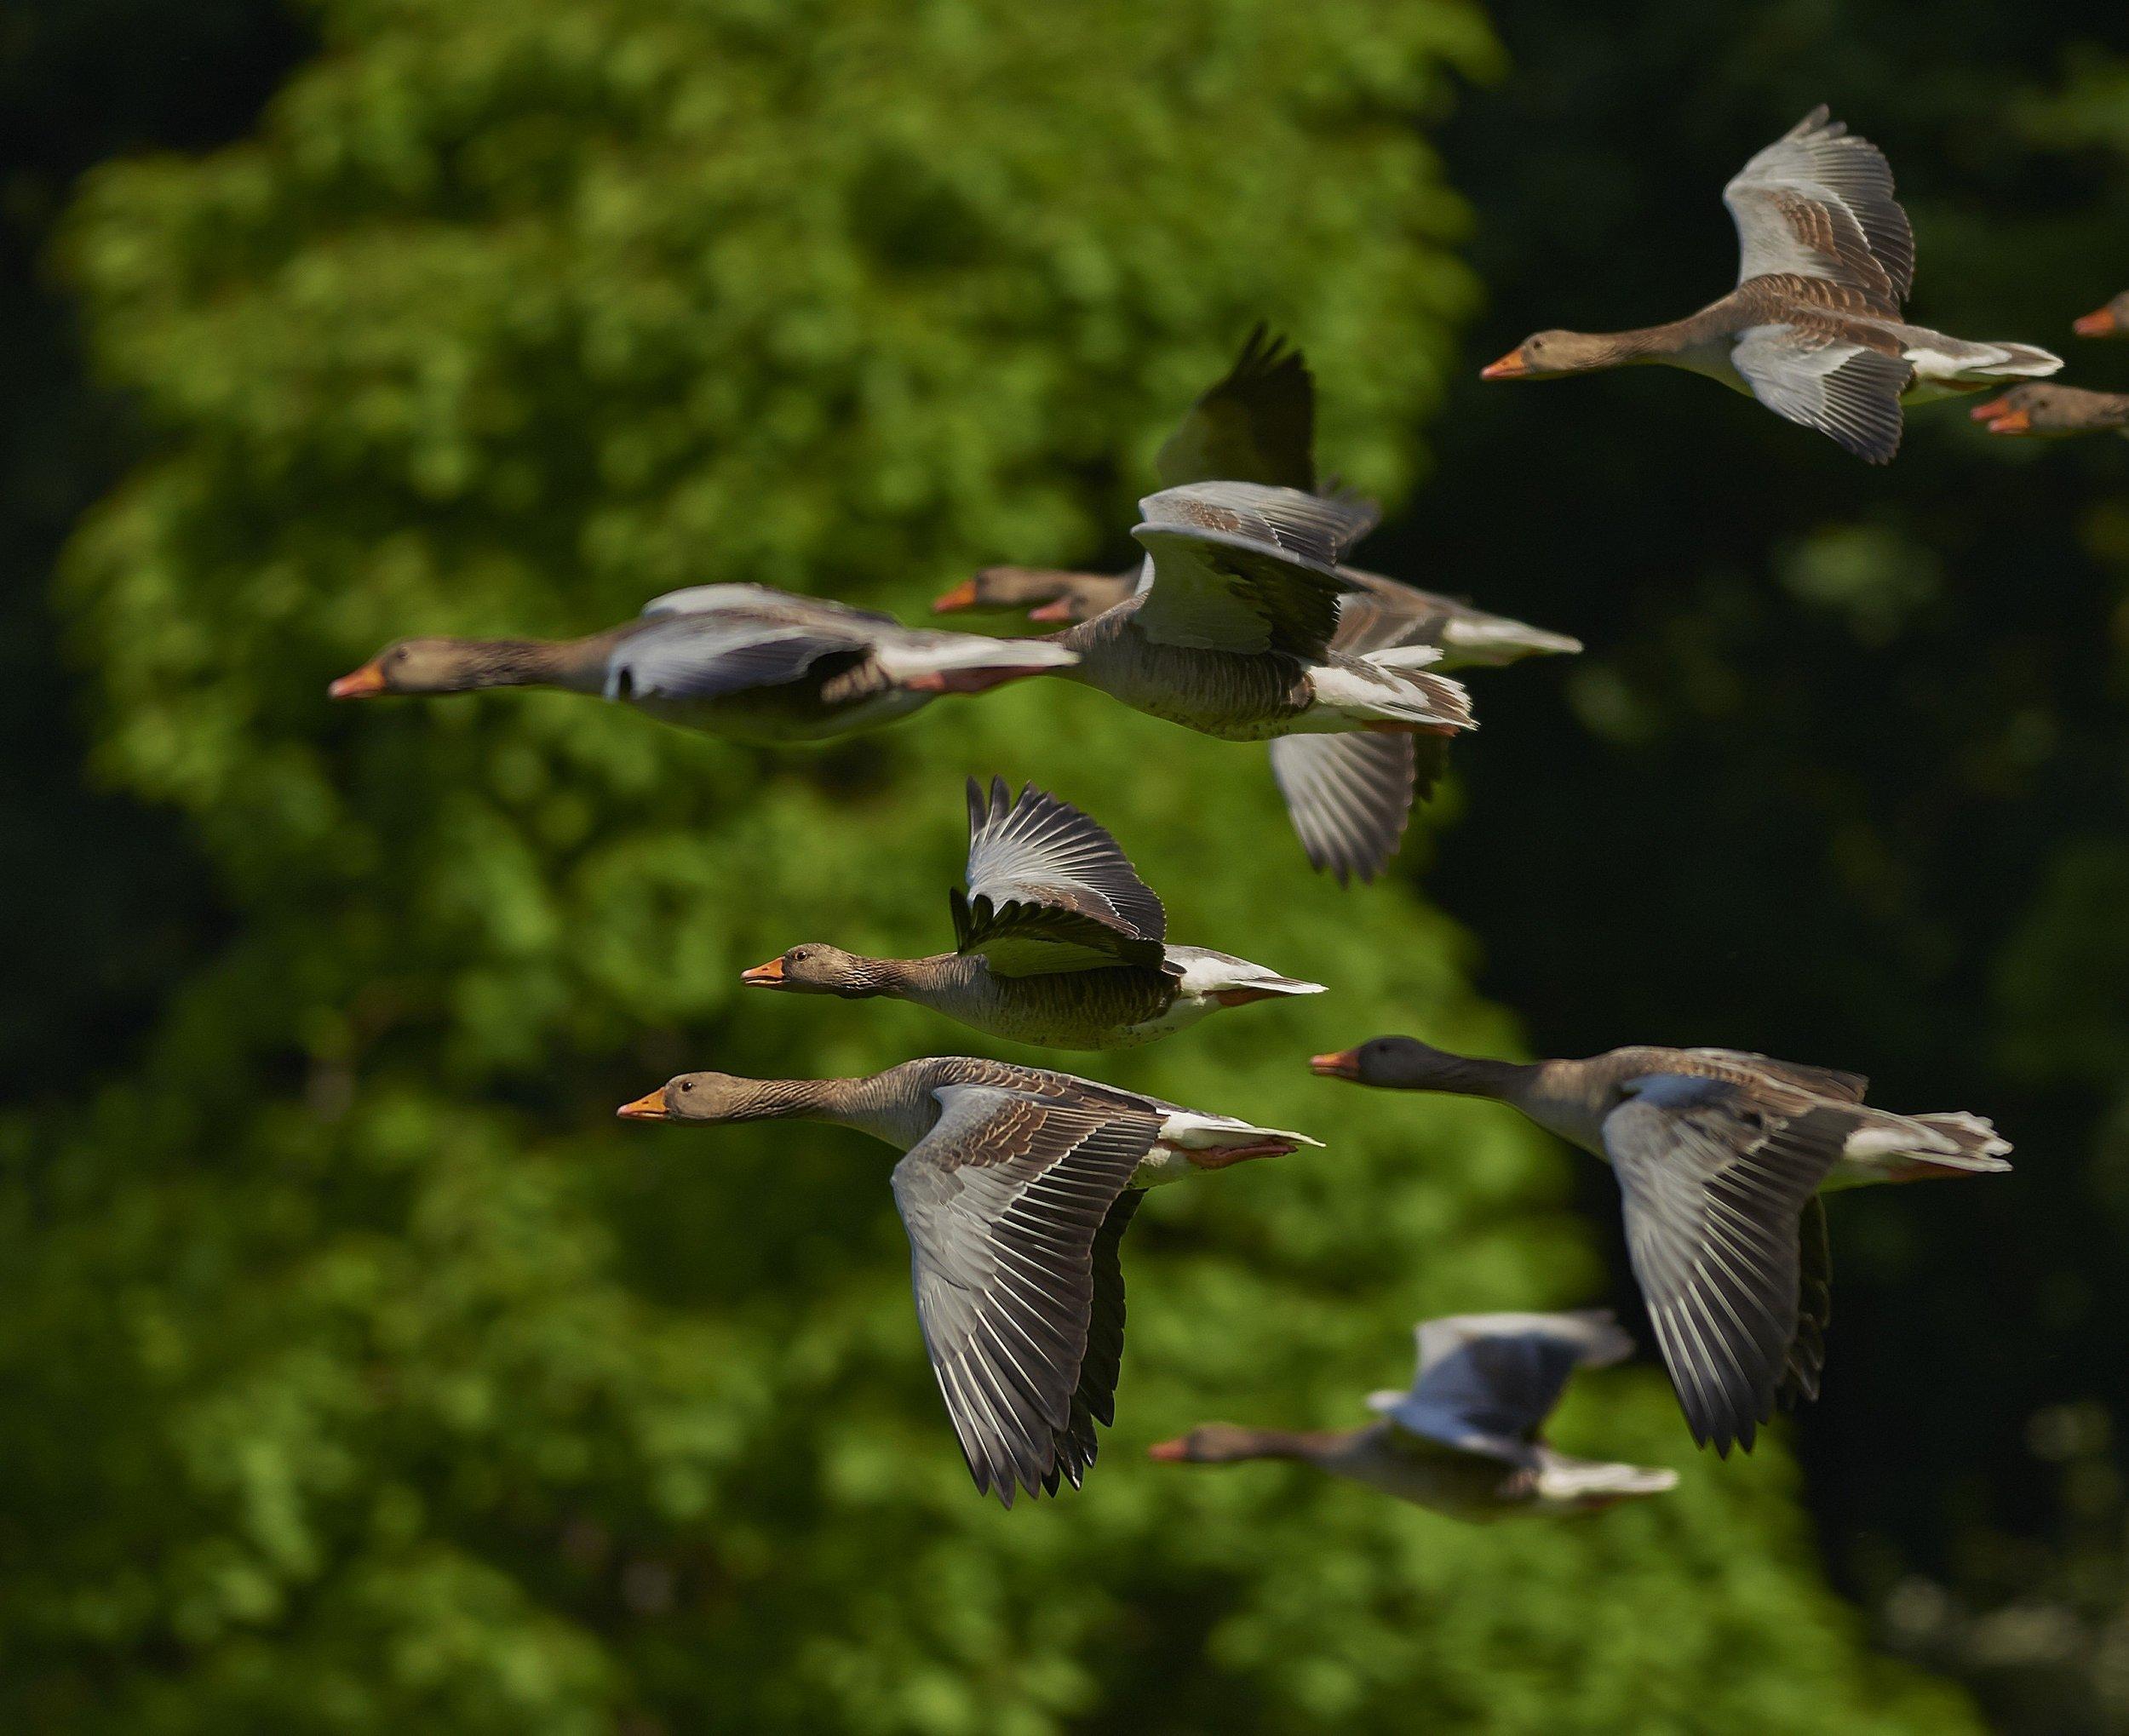 animals-birds-flock-55832 (1).jpg